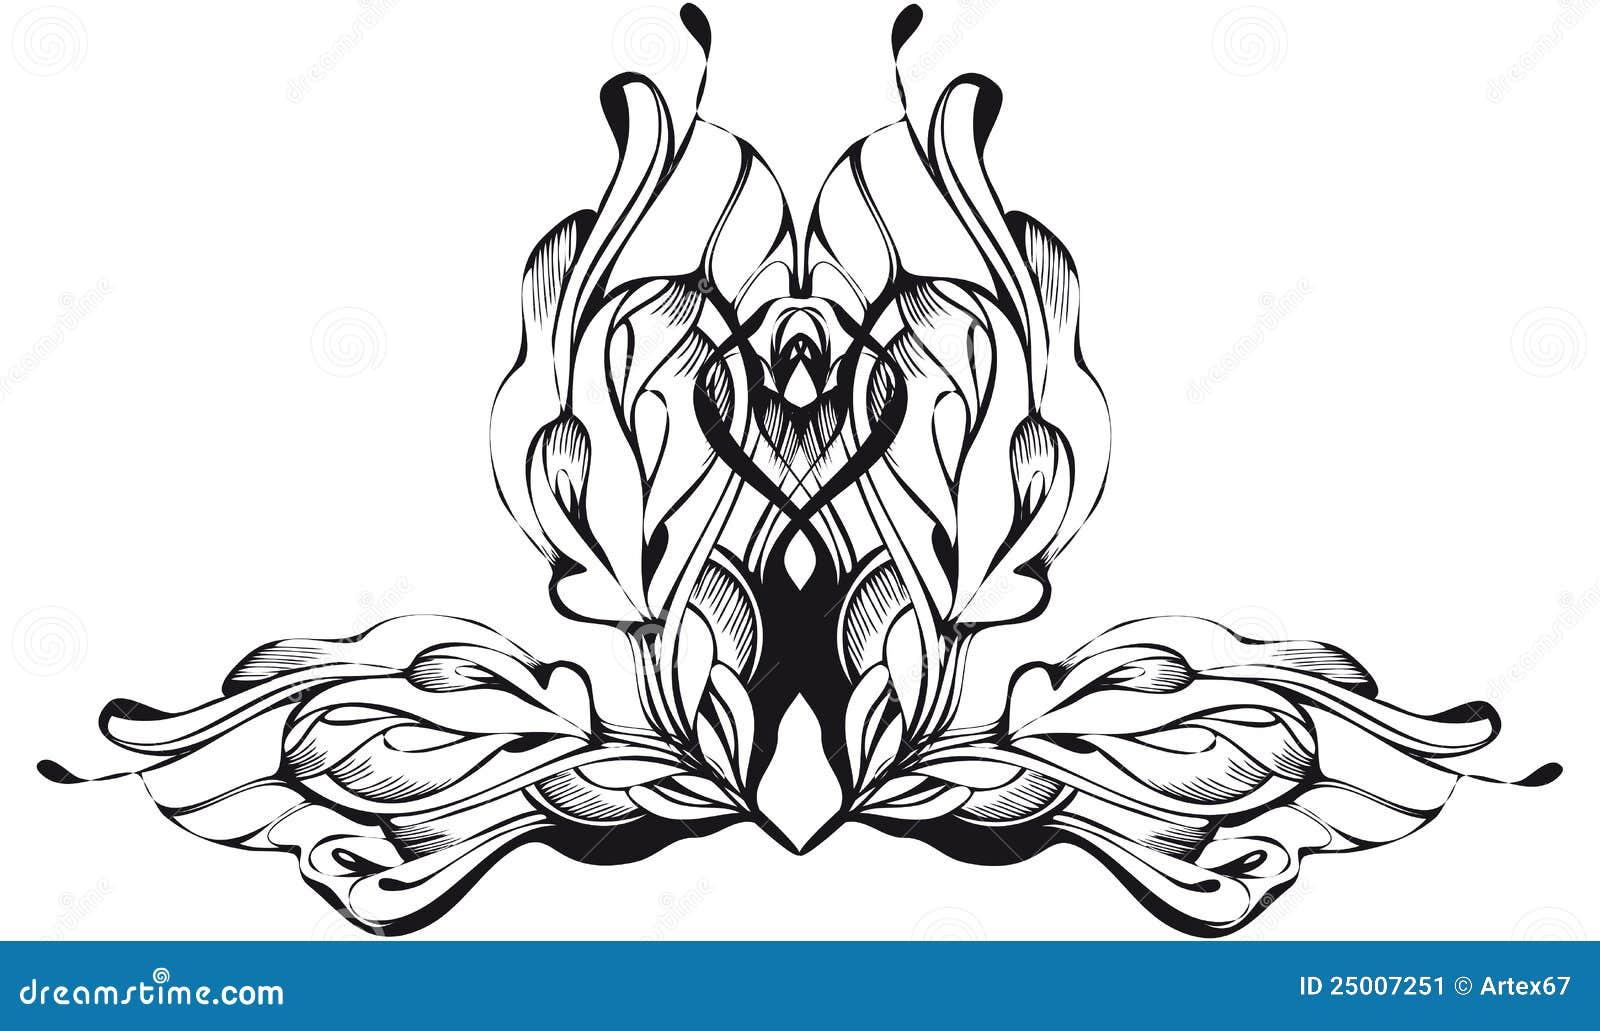 Graphic Design Art Black And White ~ Black And White Graphic Design Black And White Graphic Art View